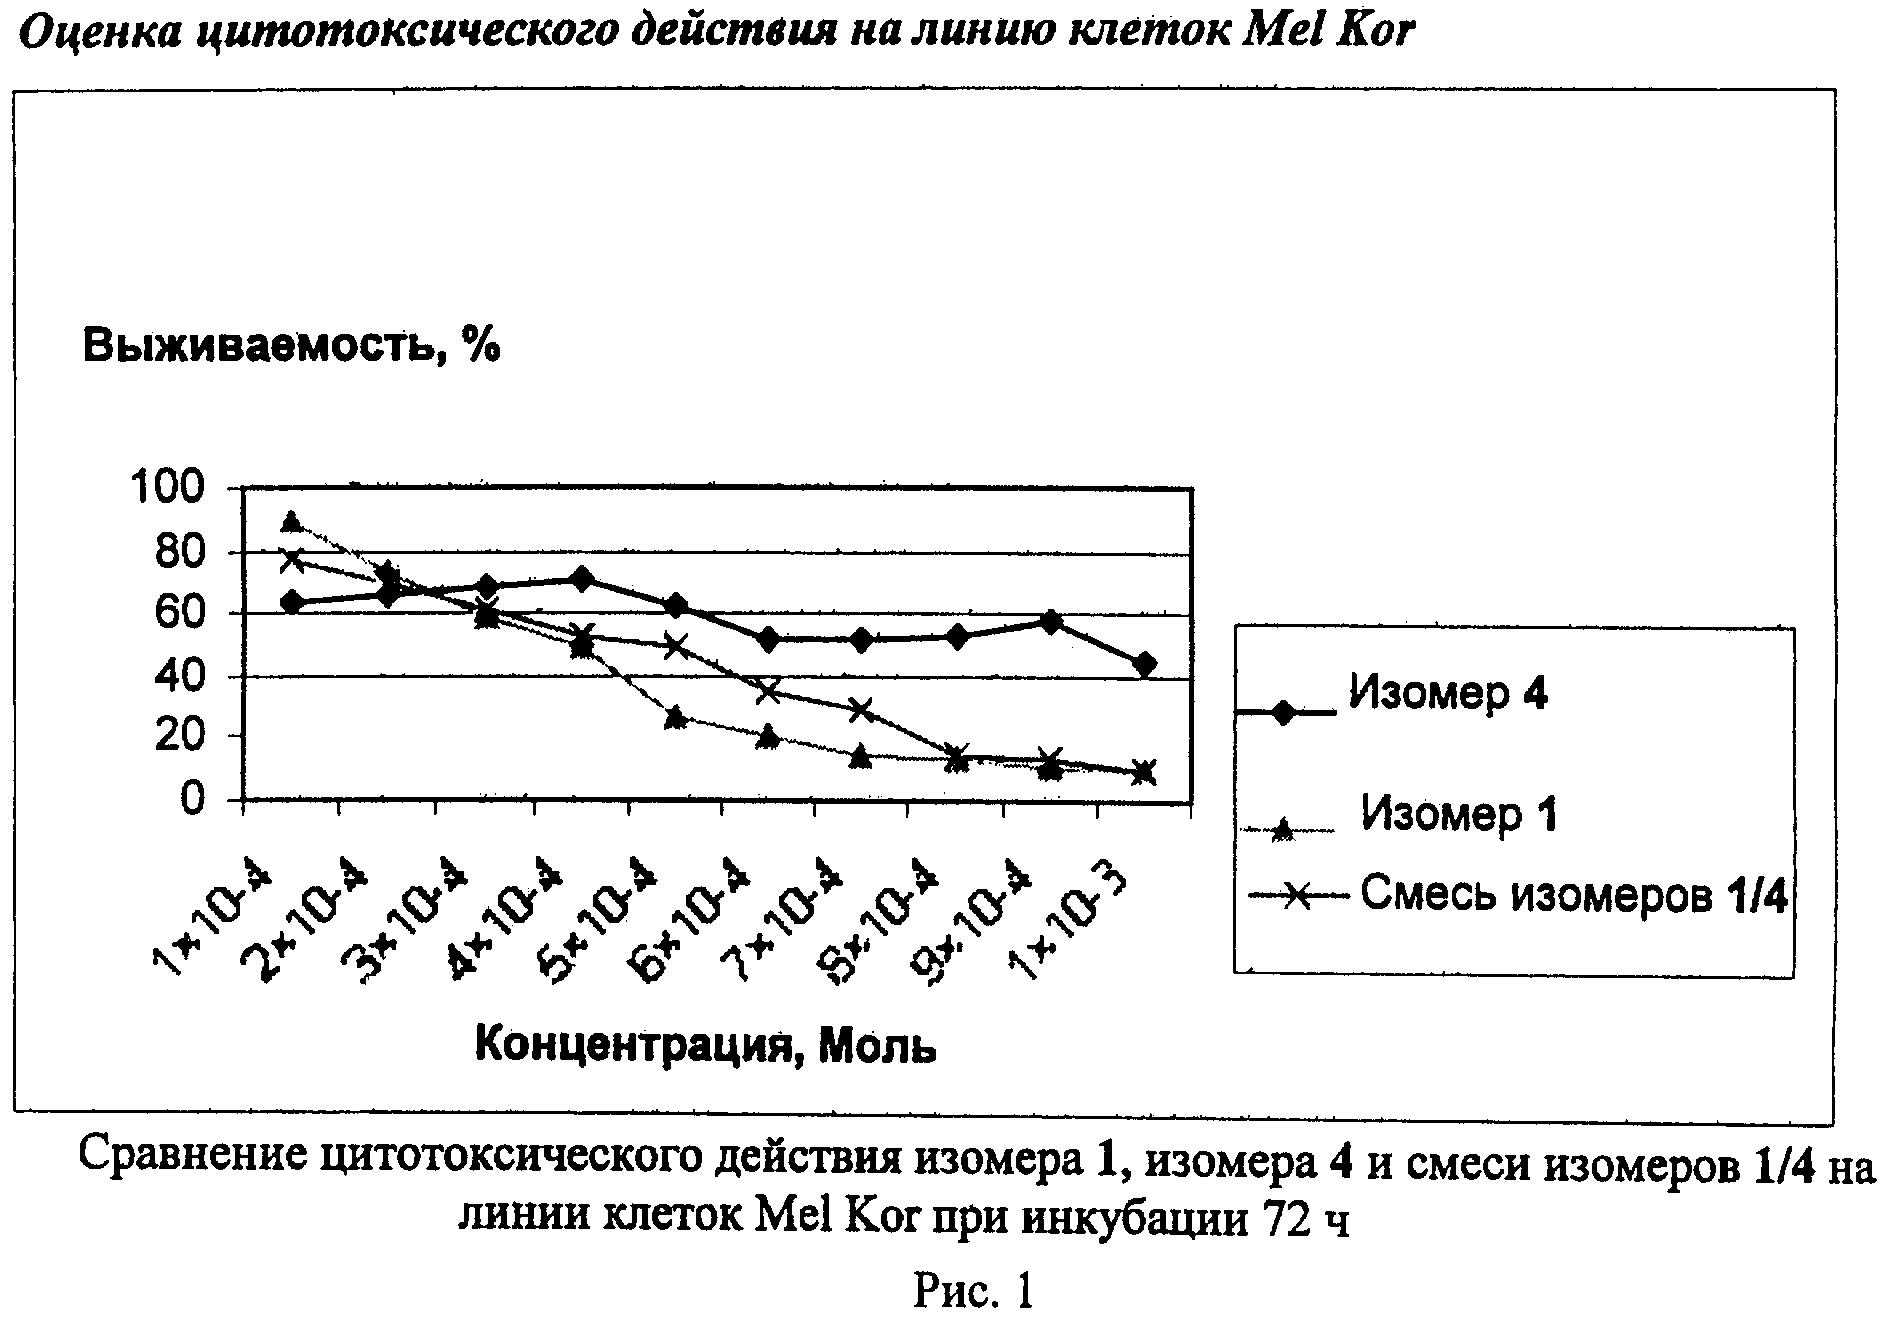 N-нитрозо-n-[(2-хлорэтил)карбамоил]-l-орнитин